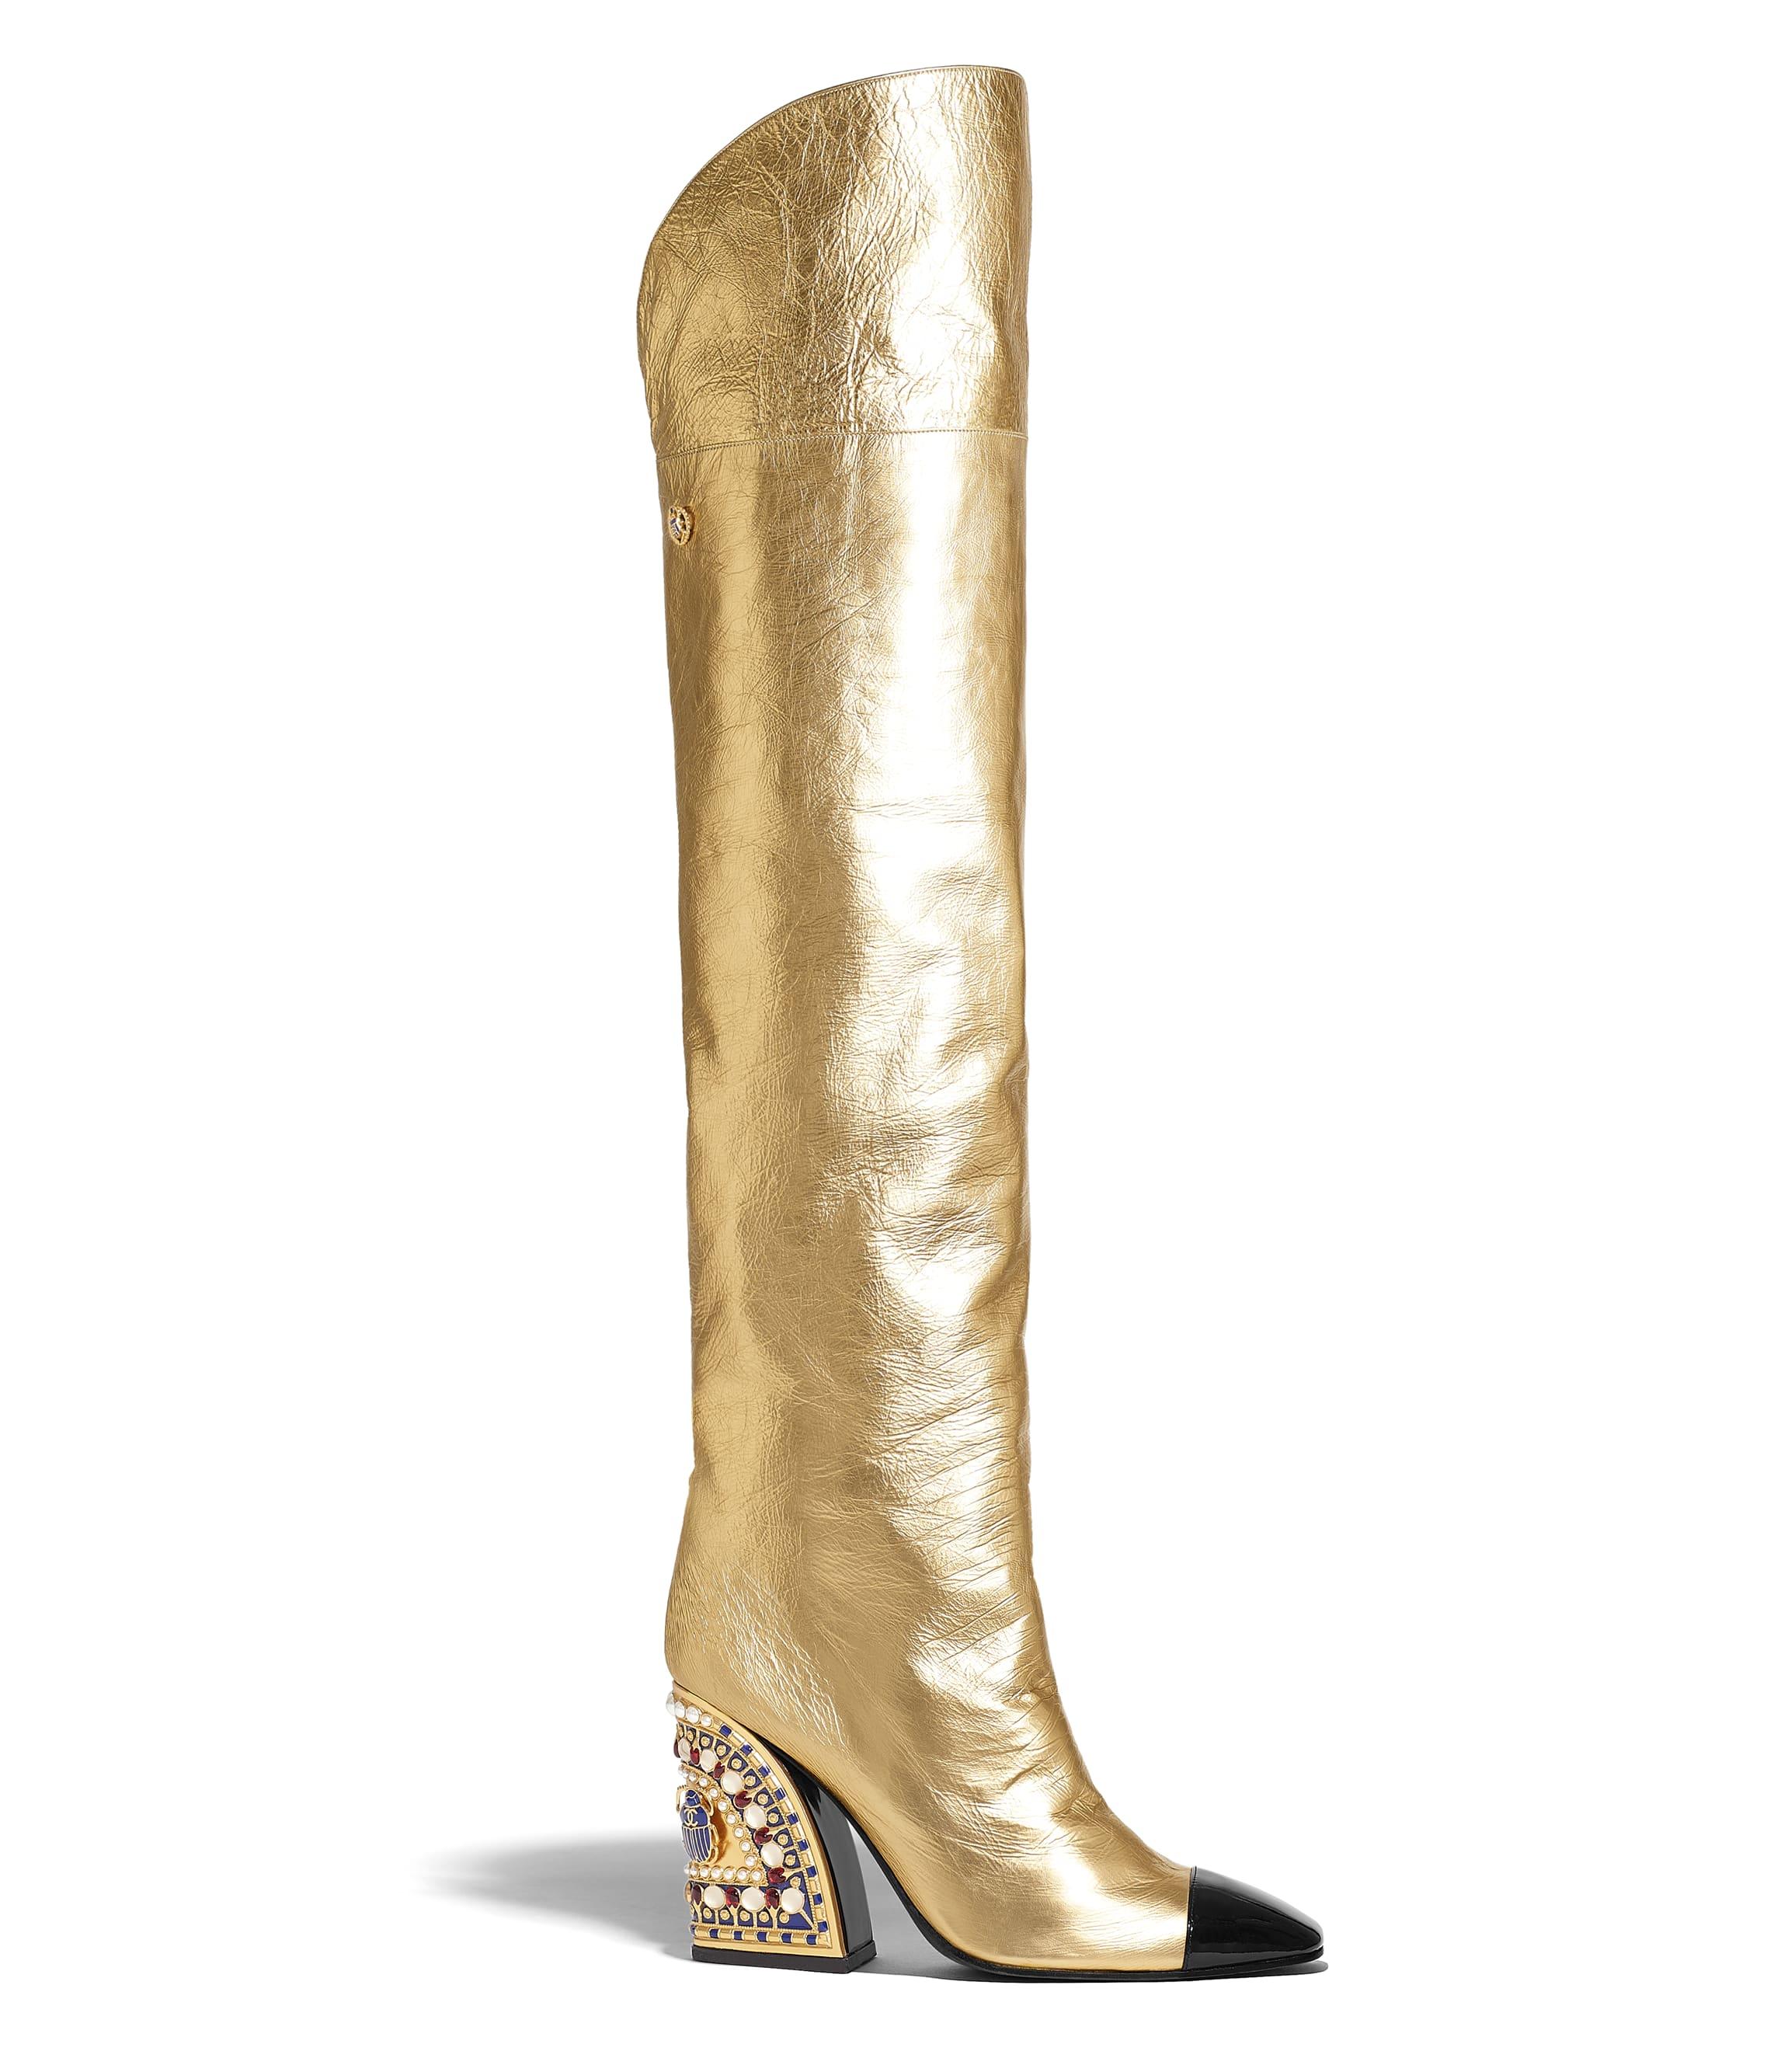 f2e64c9d6 Sapatos - CHANEL